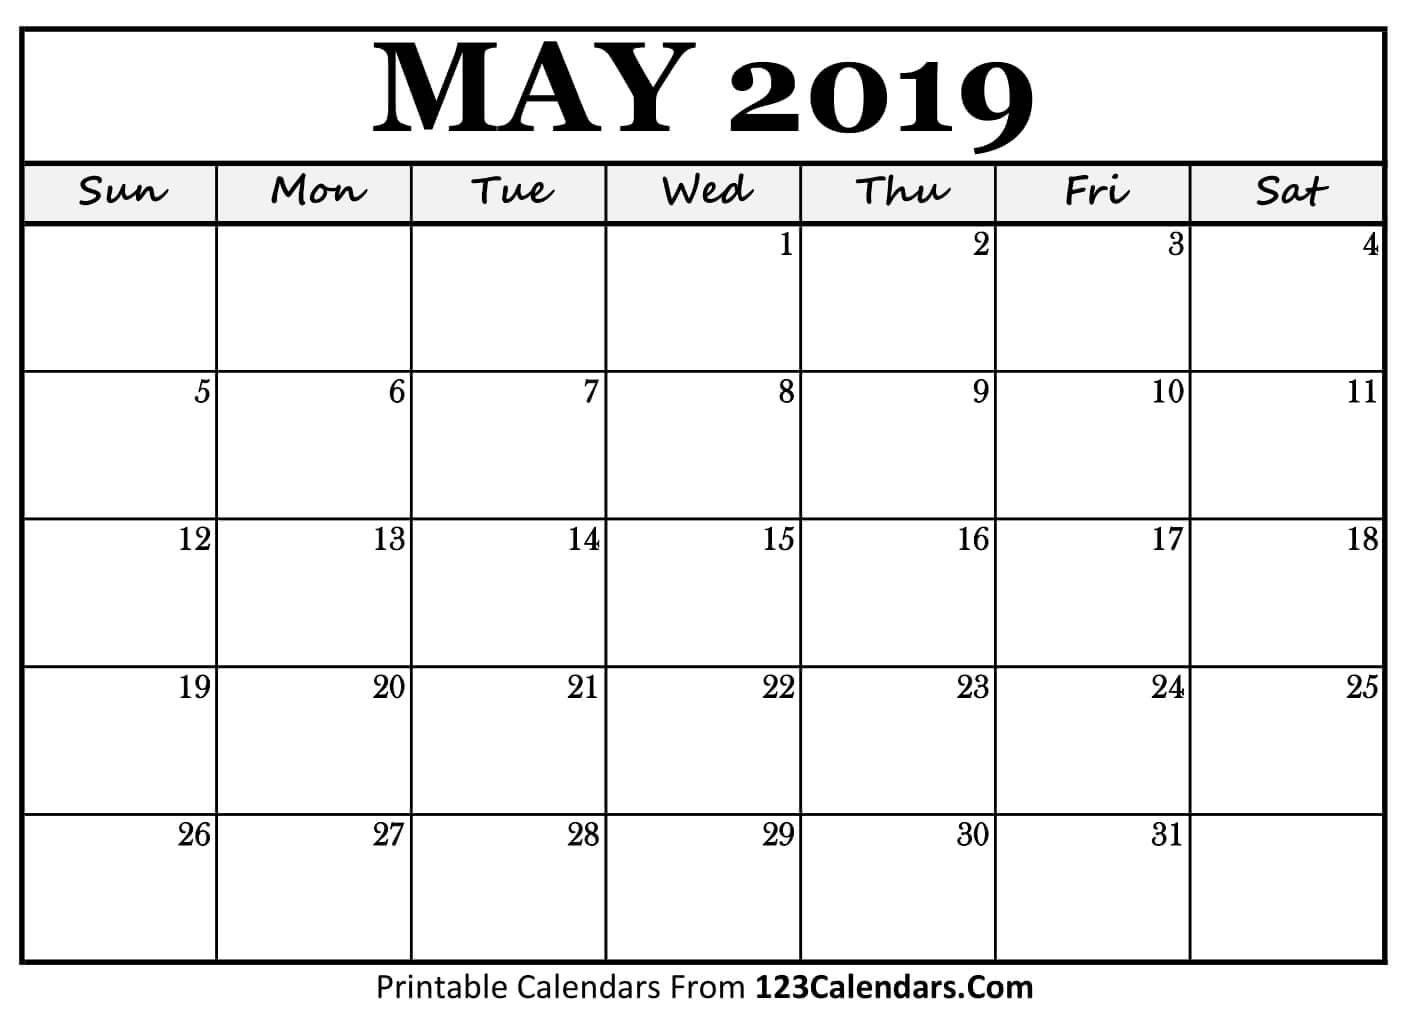 Printable May 2019 Calendar Templates – 123Calendars May 3 2019 Calendar